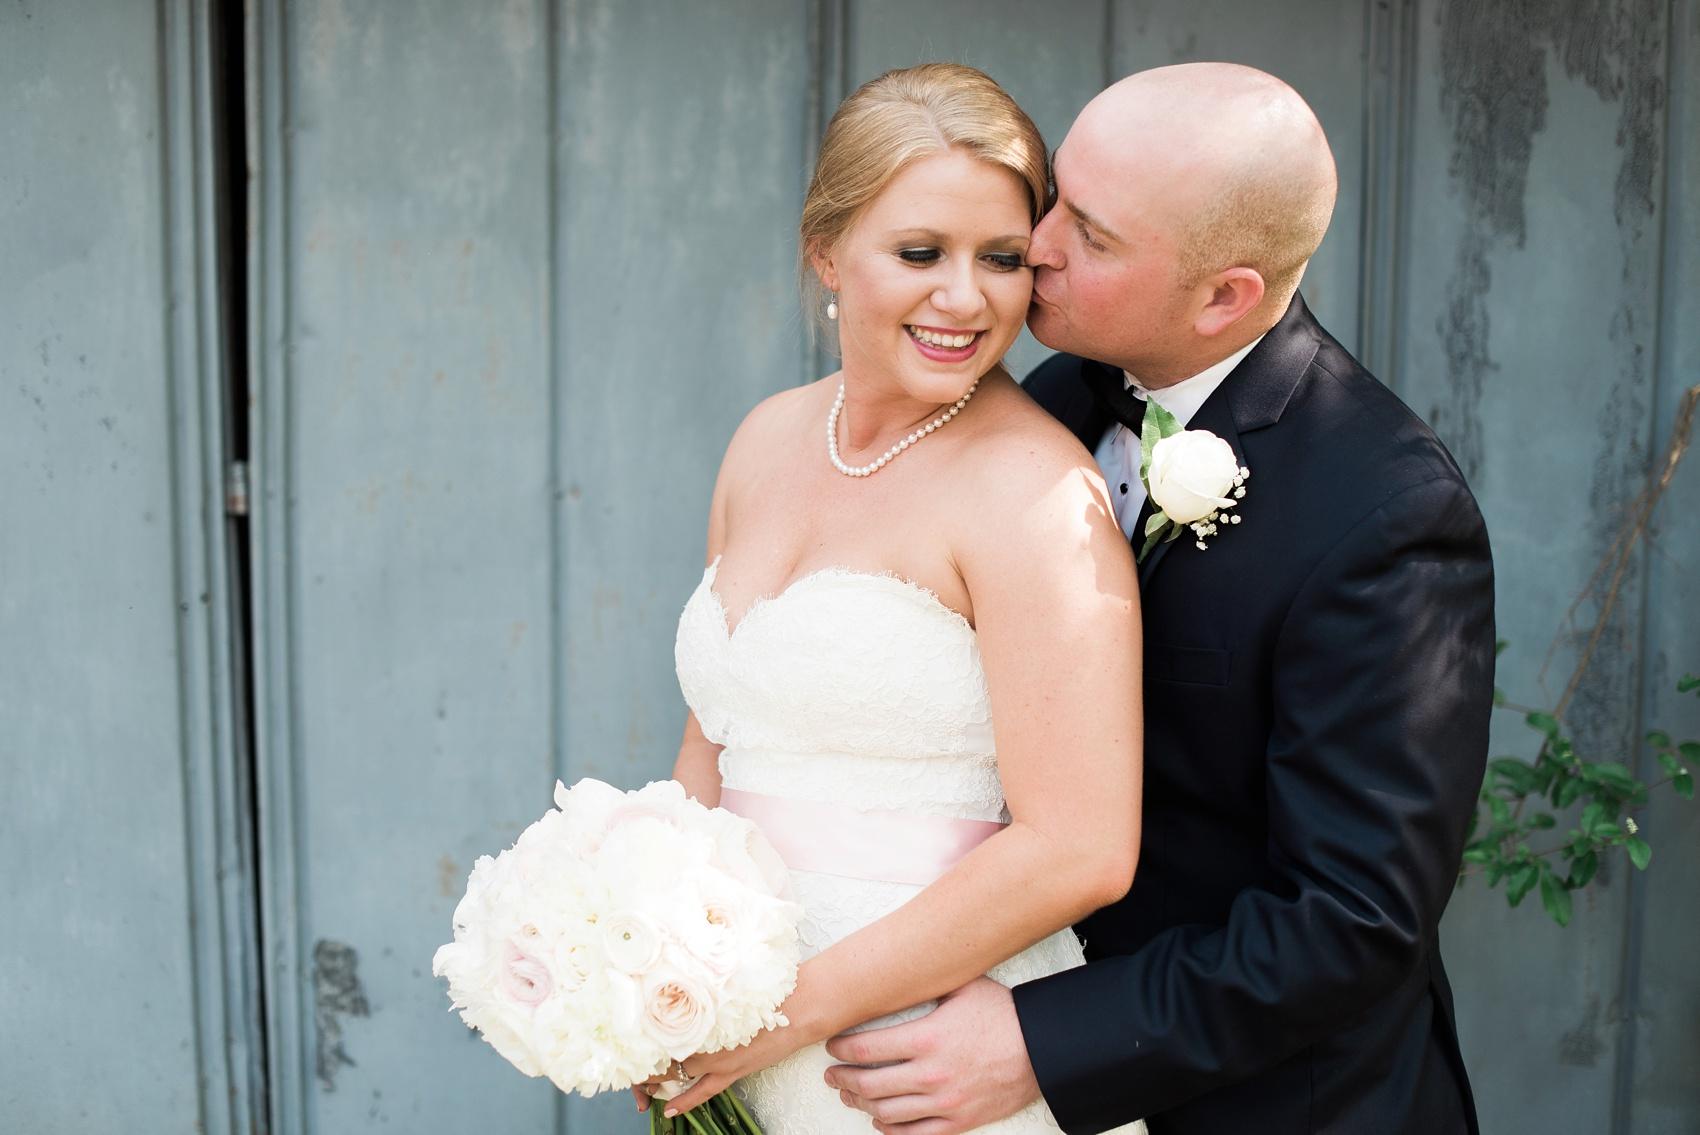 lexington_wedding_photographer_0113.jpg